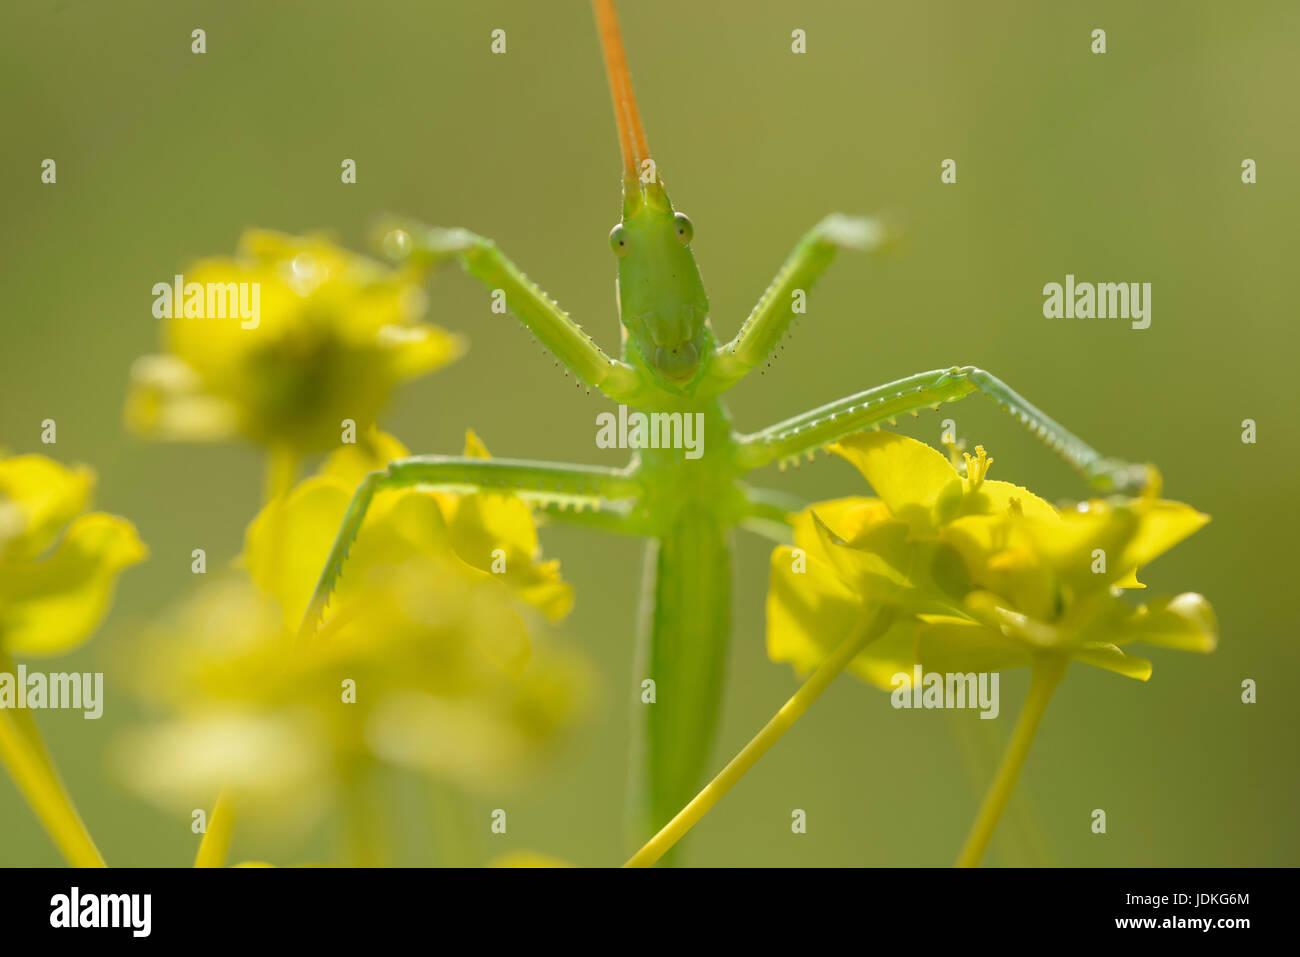 Larva of the big saw frights sits on blossoms, Larve der Großen Sägeschrecke sitzt auf Blüten - Stock Image